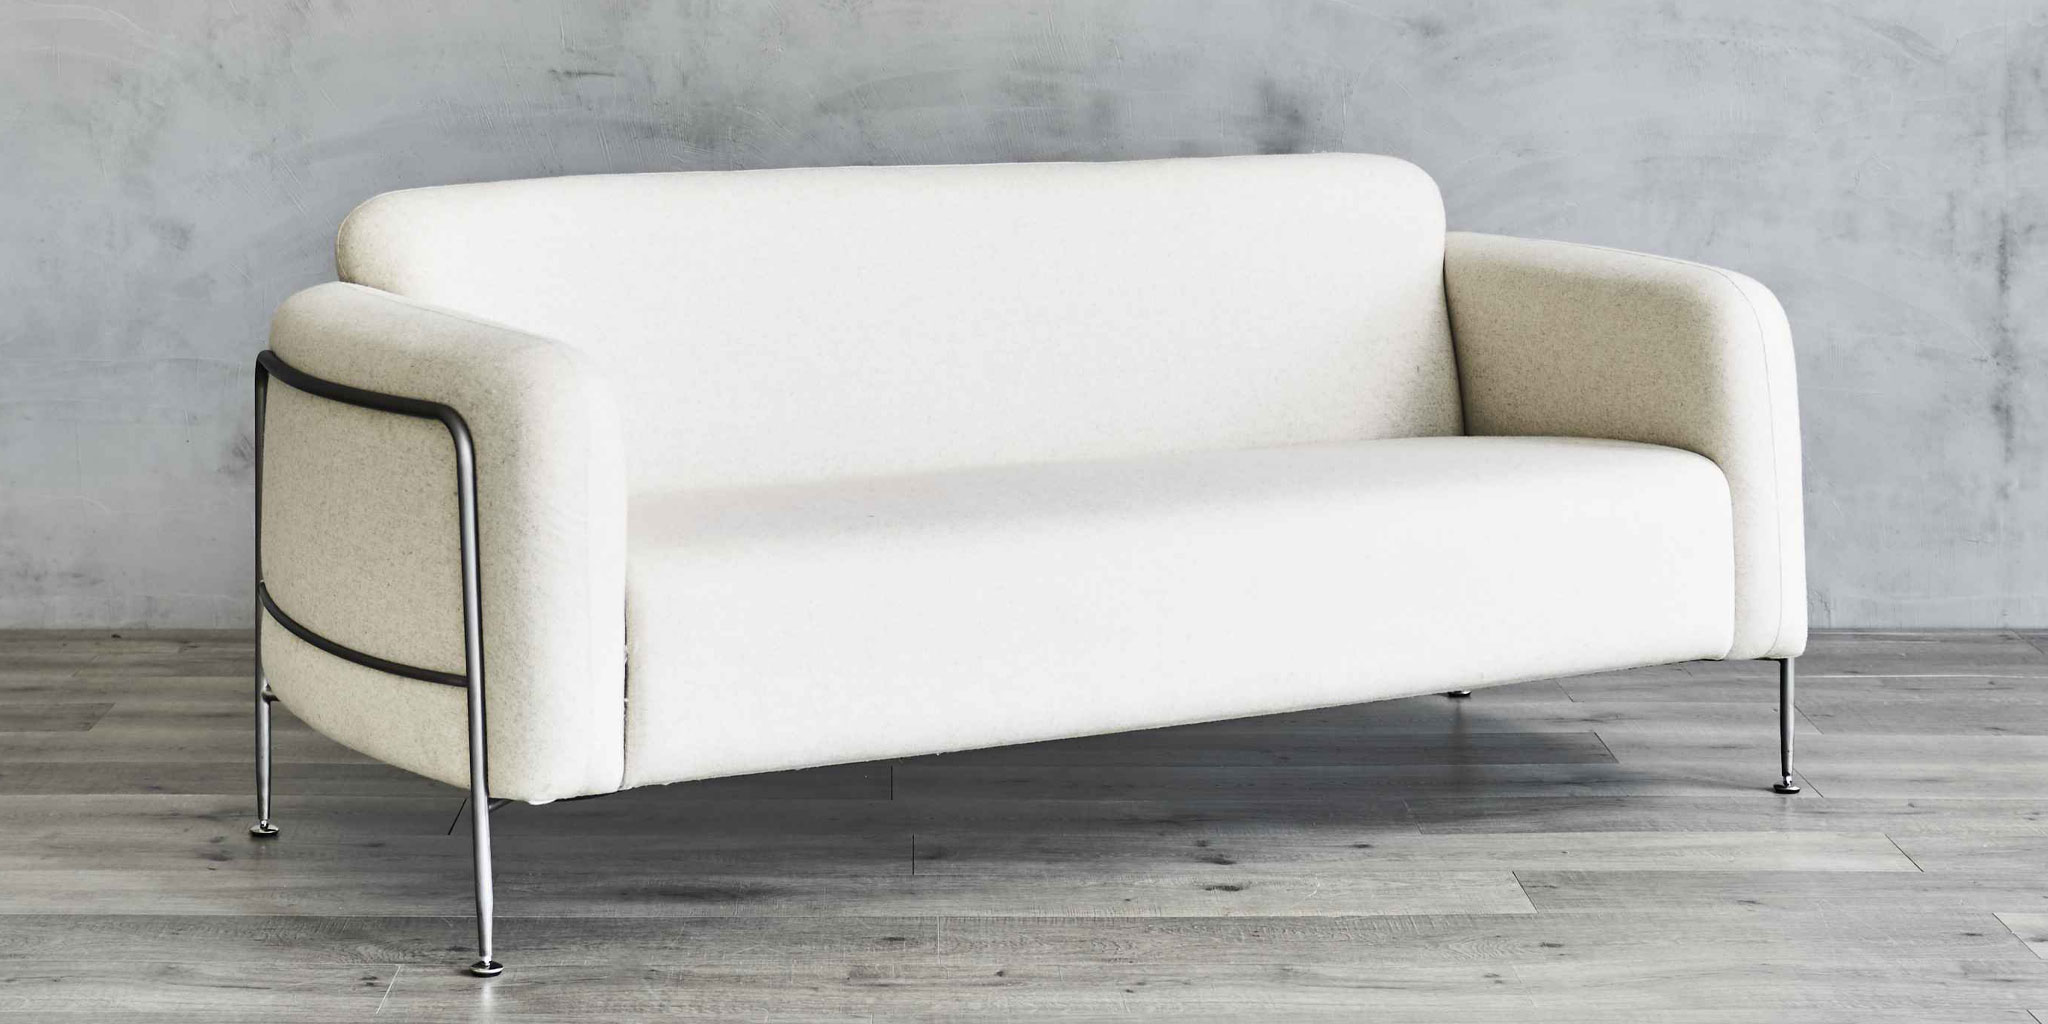 Randers Sofa